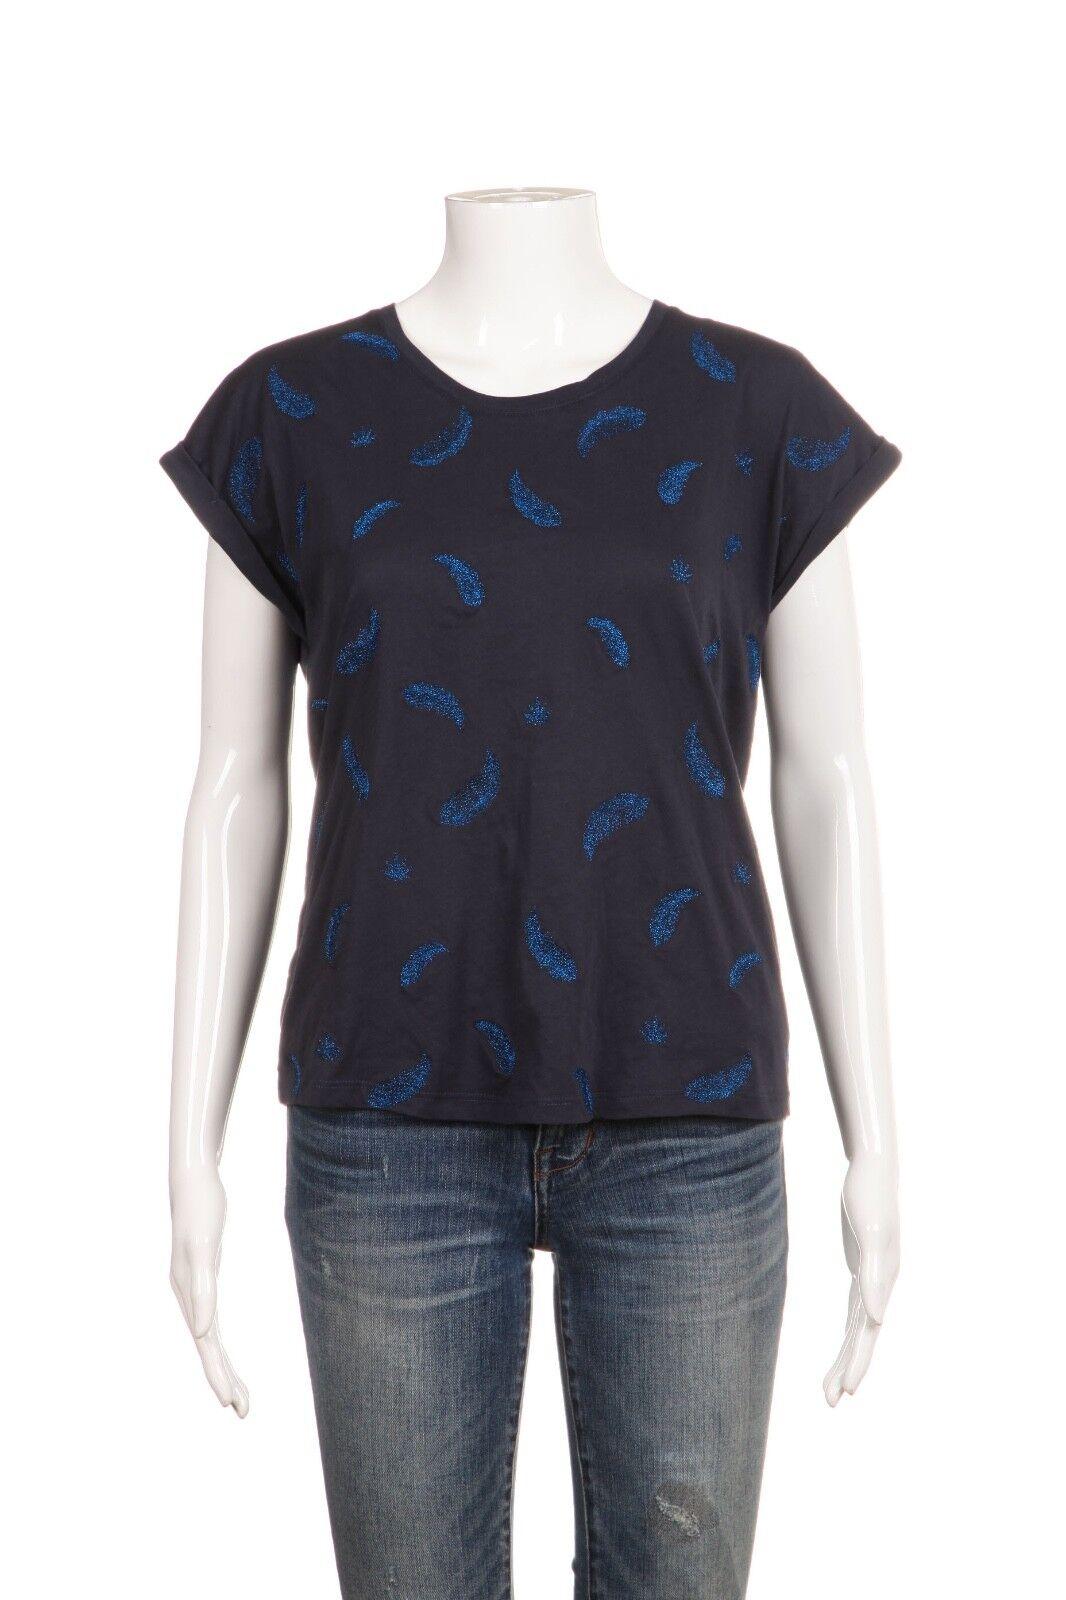 BERENICE bluee Tee Size Medium Metallic Embroidered Top Short Sleeve